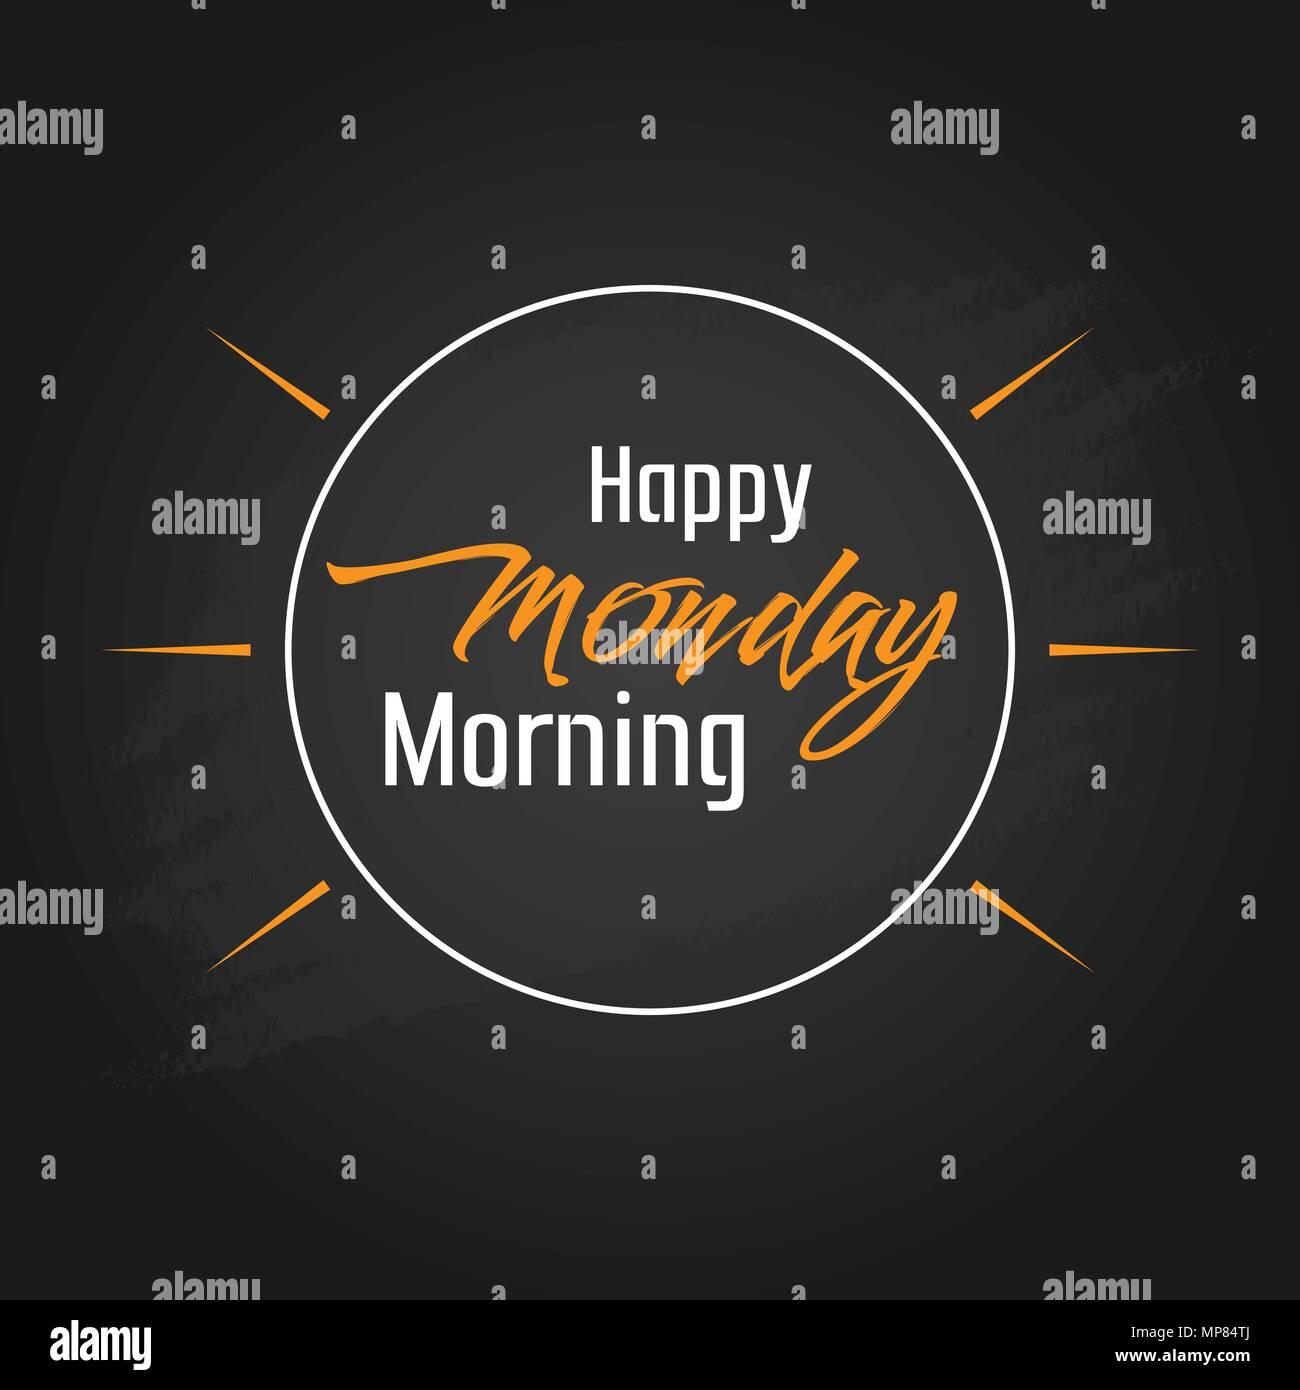 Happy Monday Morning Vector Template Design Stock Vector Image Art Alamy